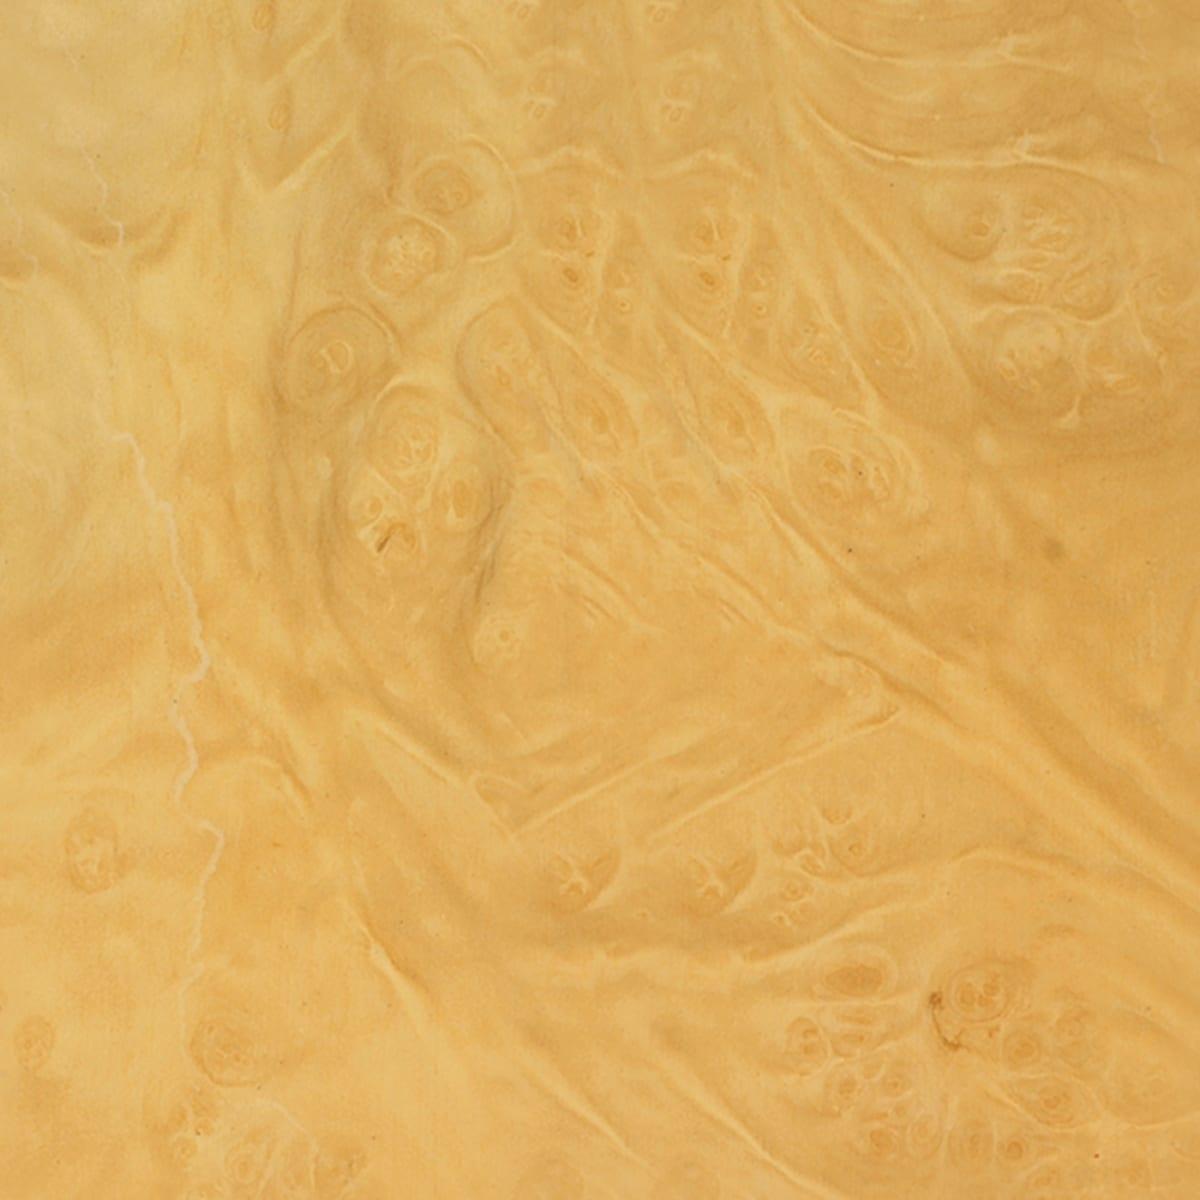 olive wood root